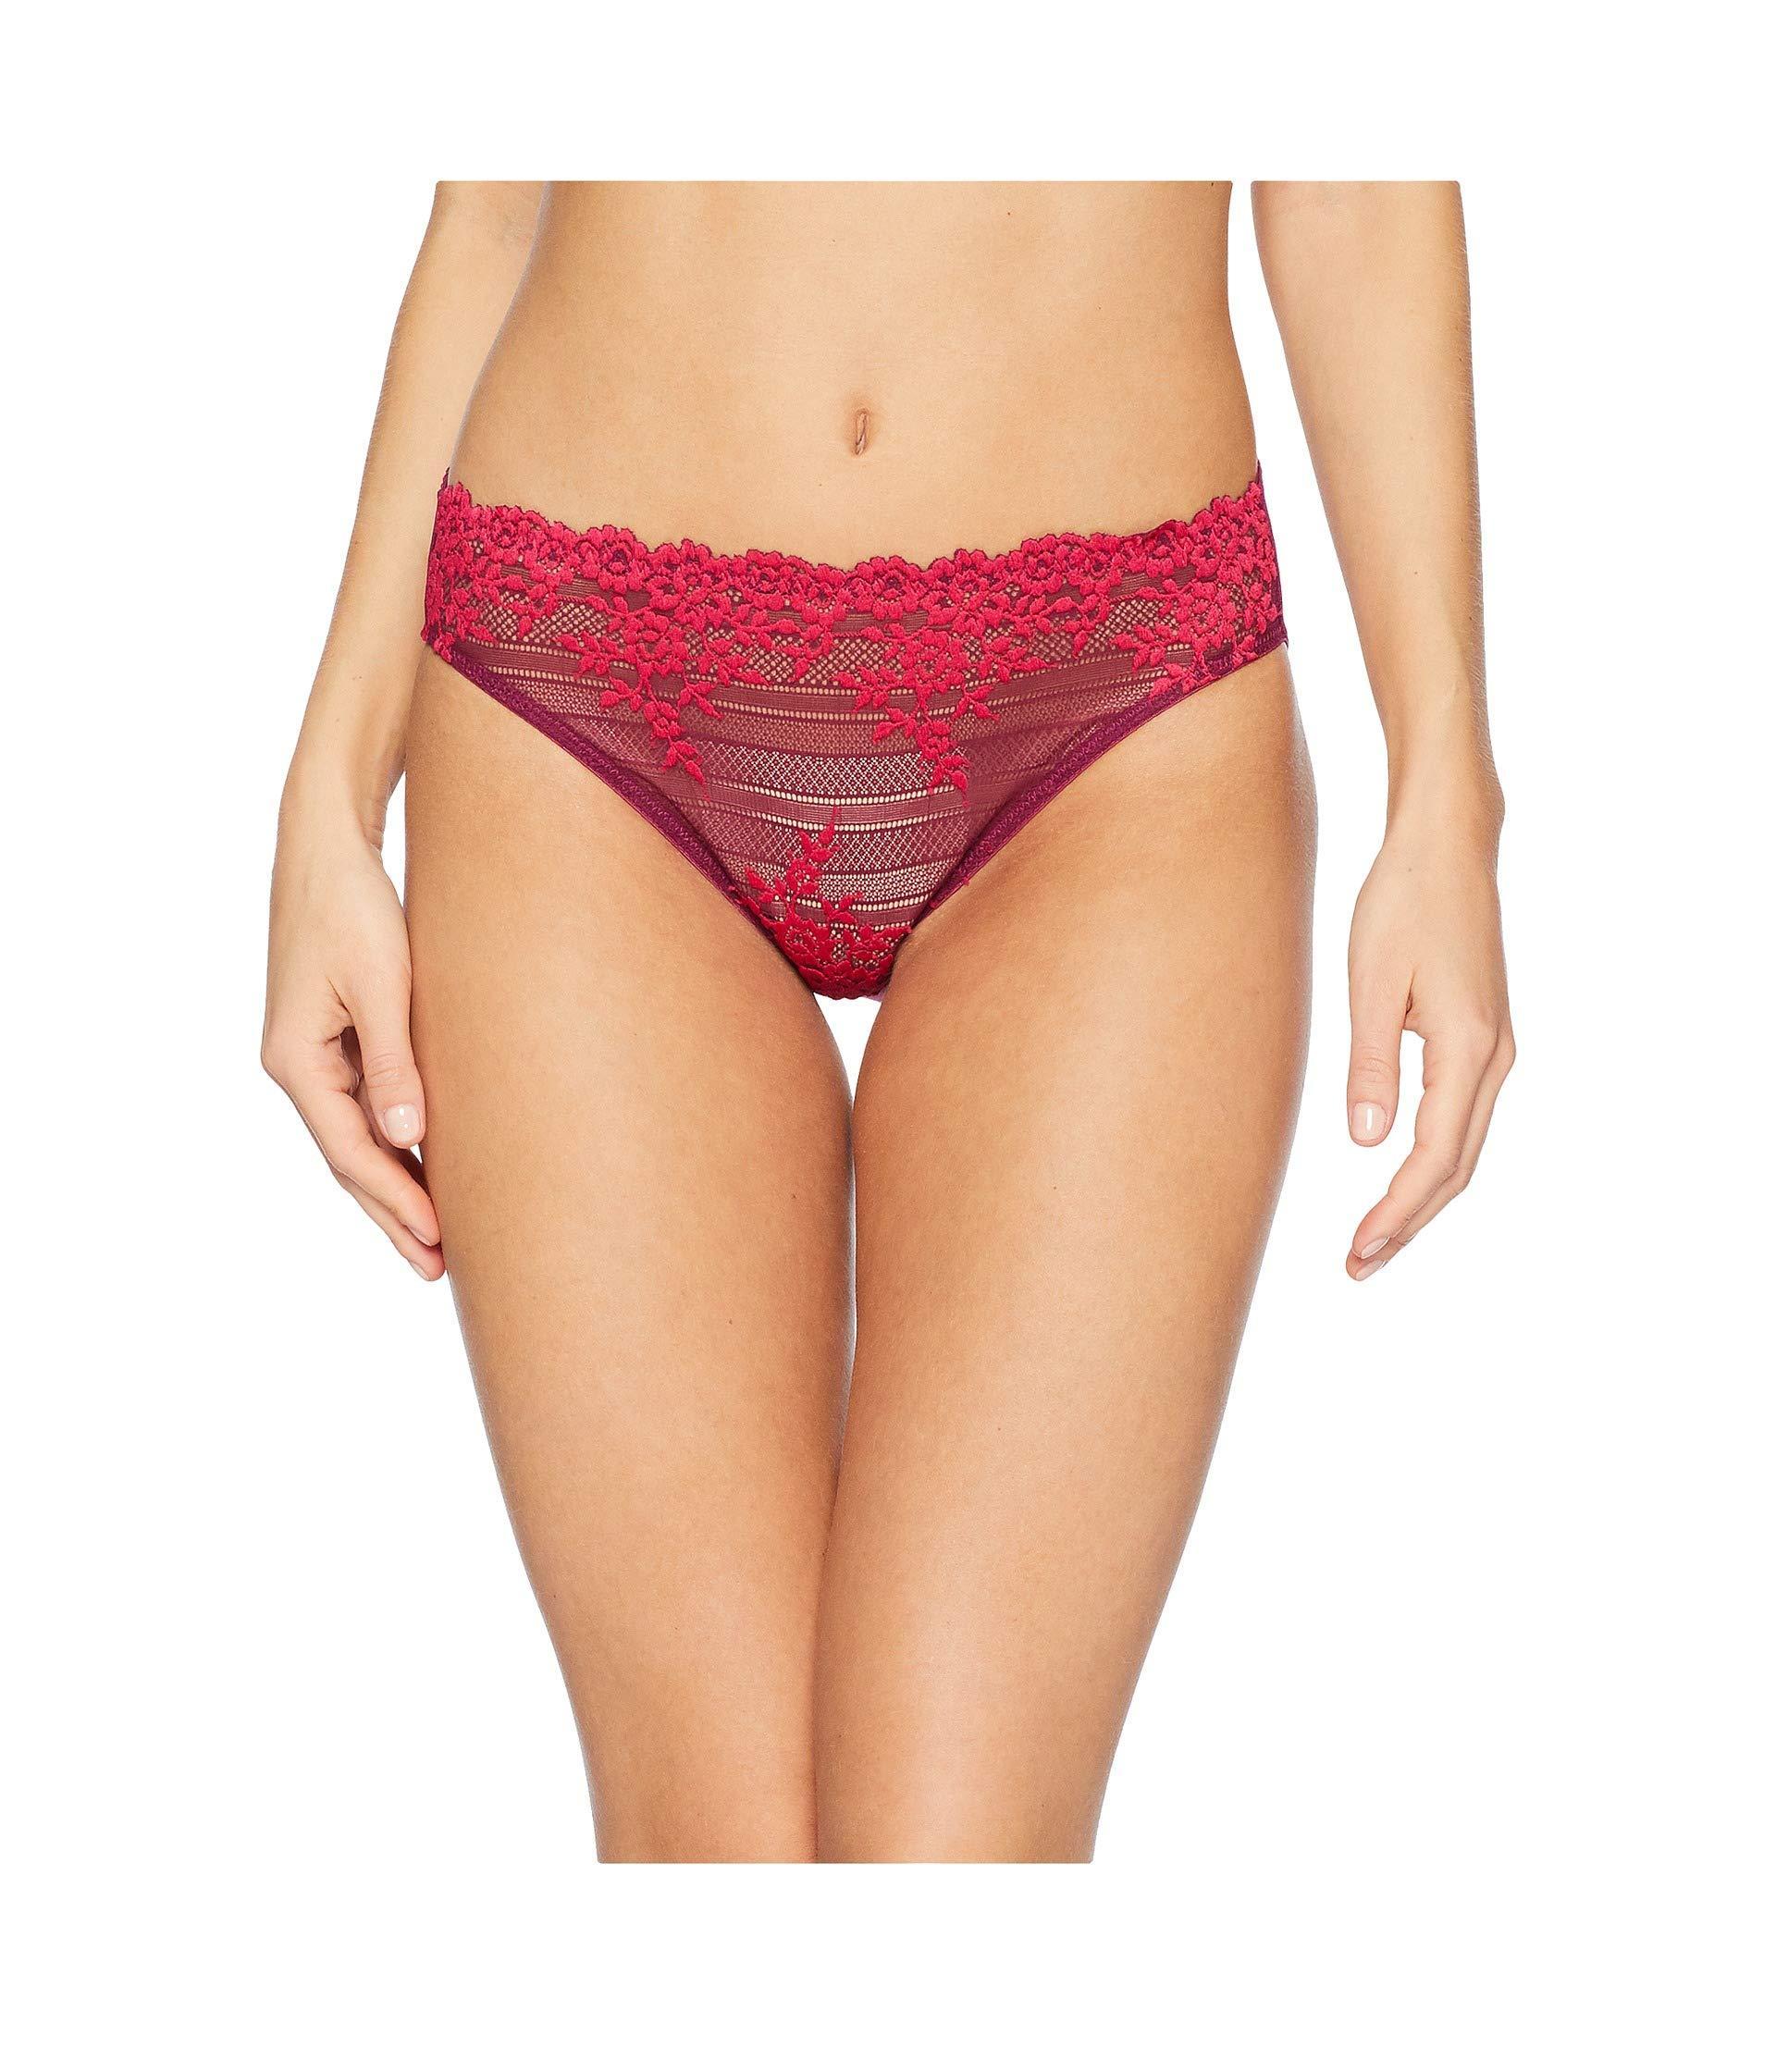 3f789913765dd Wacoal. Women s Embrace Lace Bikini